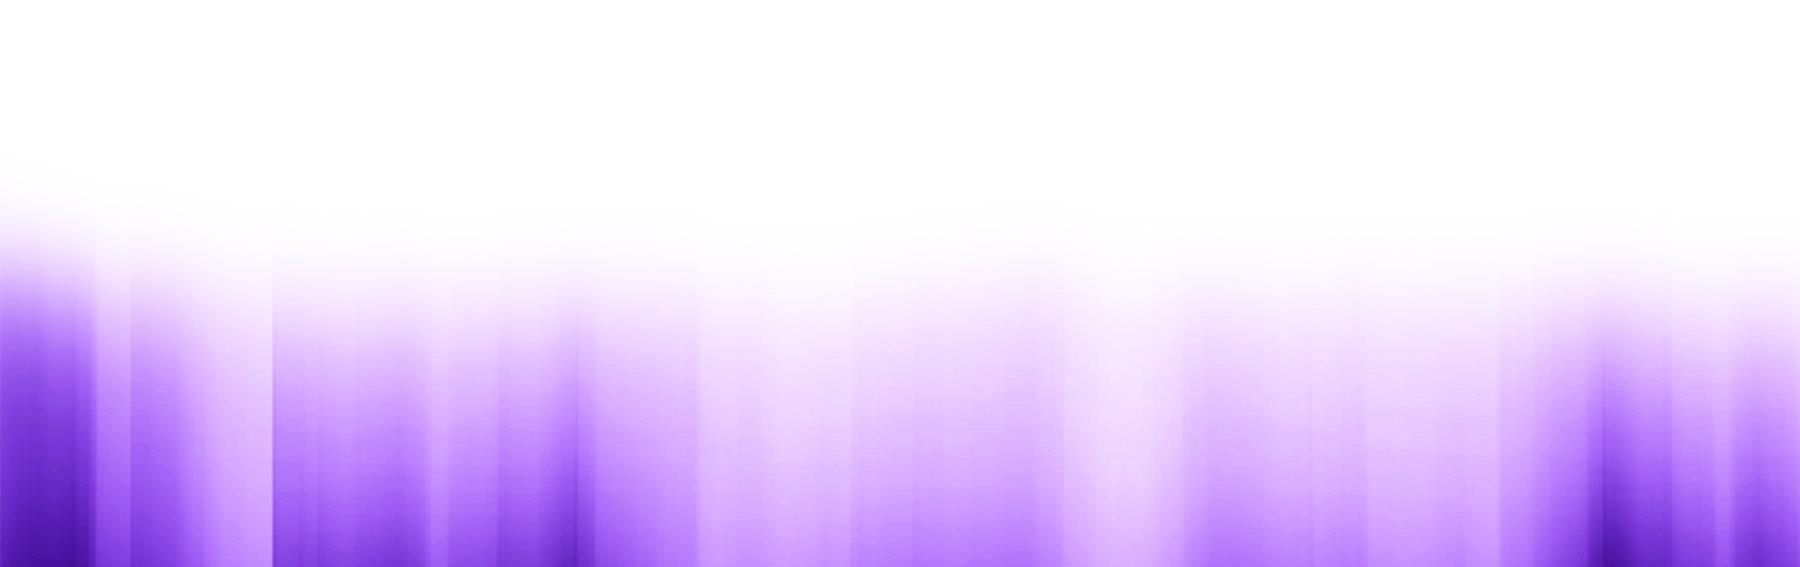 background_purple